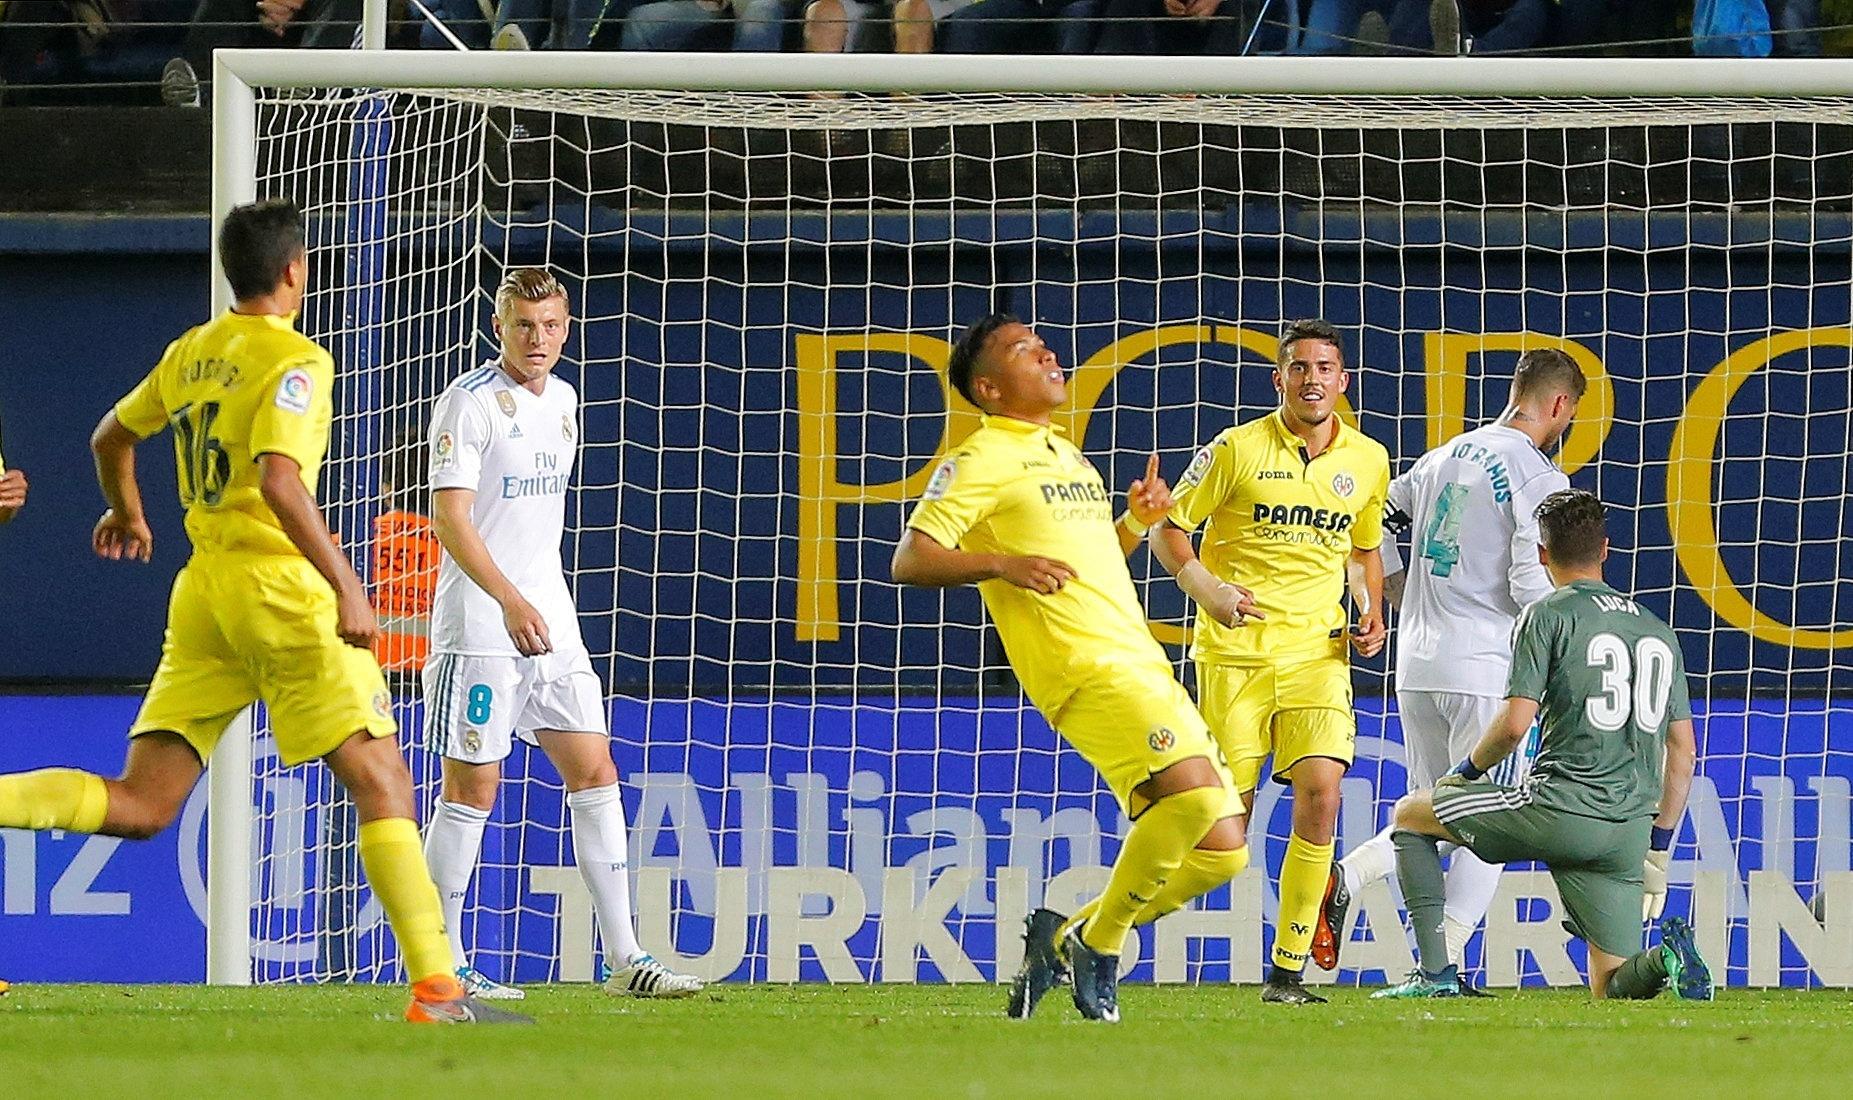 Luca Zidane observa enquanto Martinez marca pelo Villarreal contra o Real Madrid